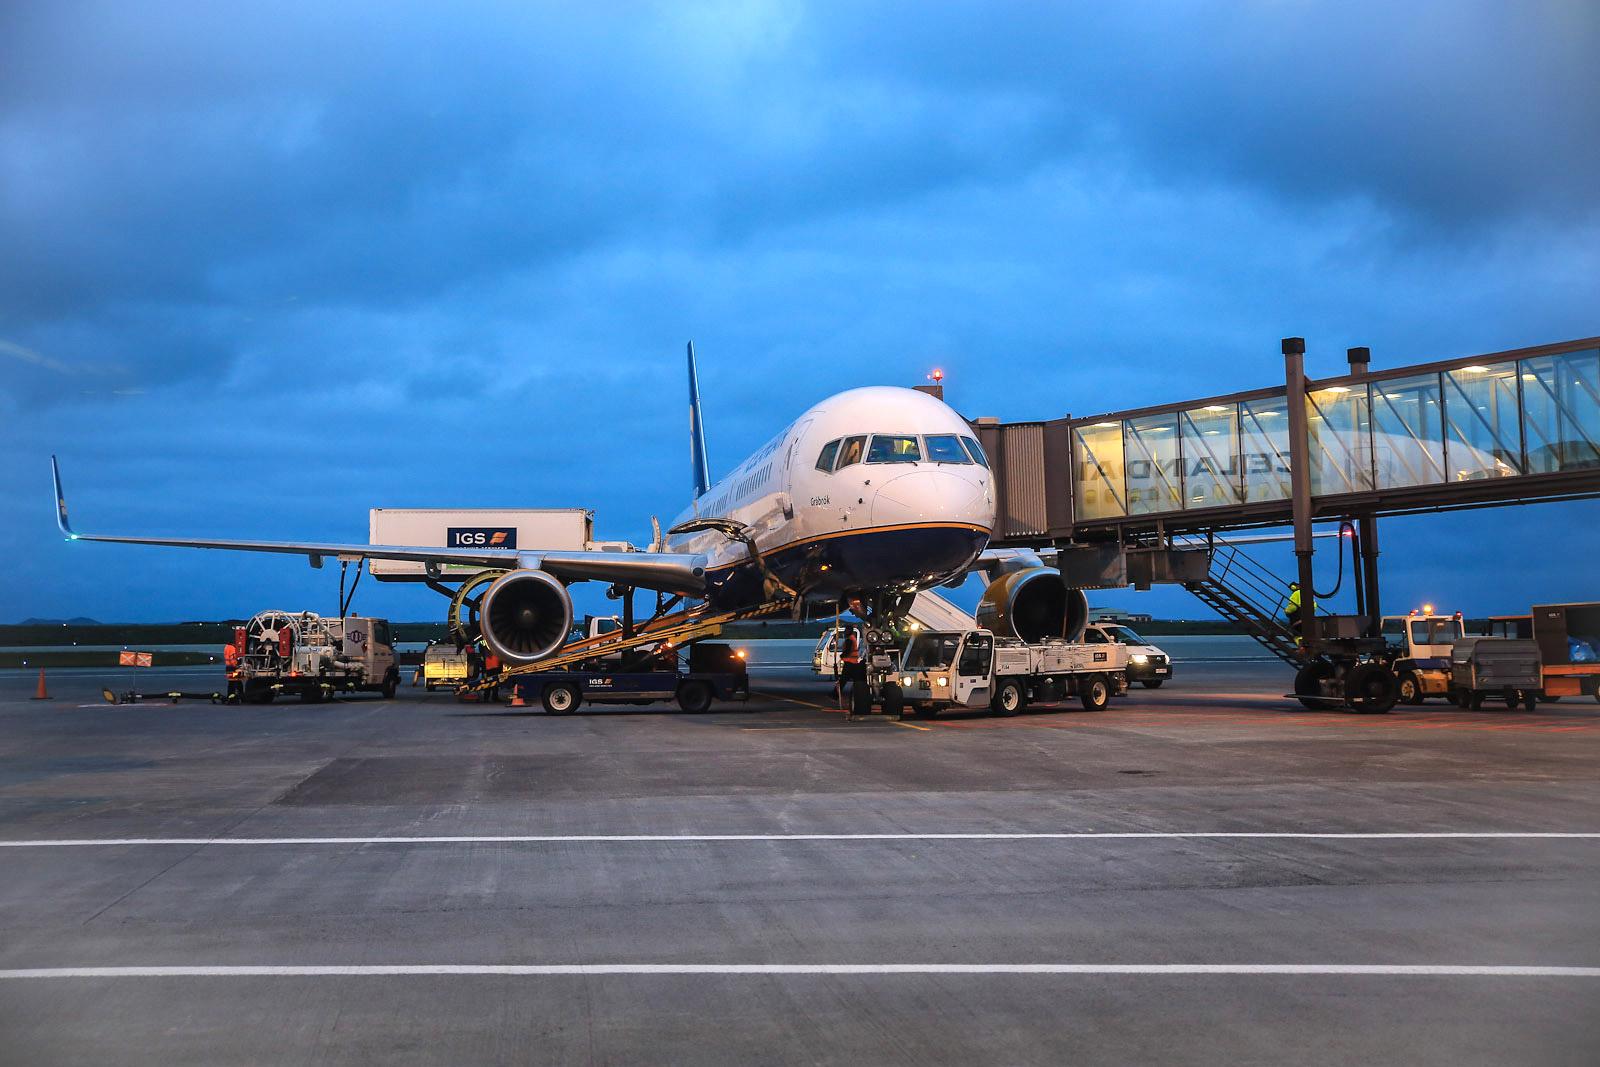 Боинг-757-200 авиакомпании Icelandair в аэропорту Рейкьявика